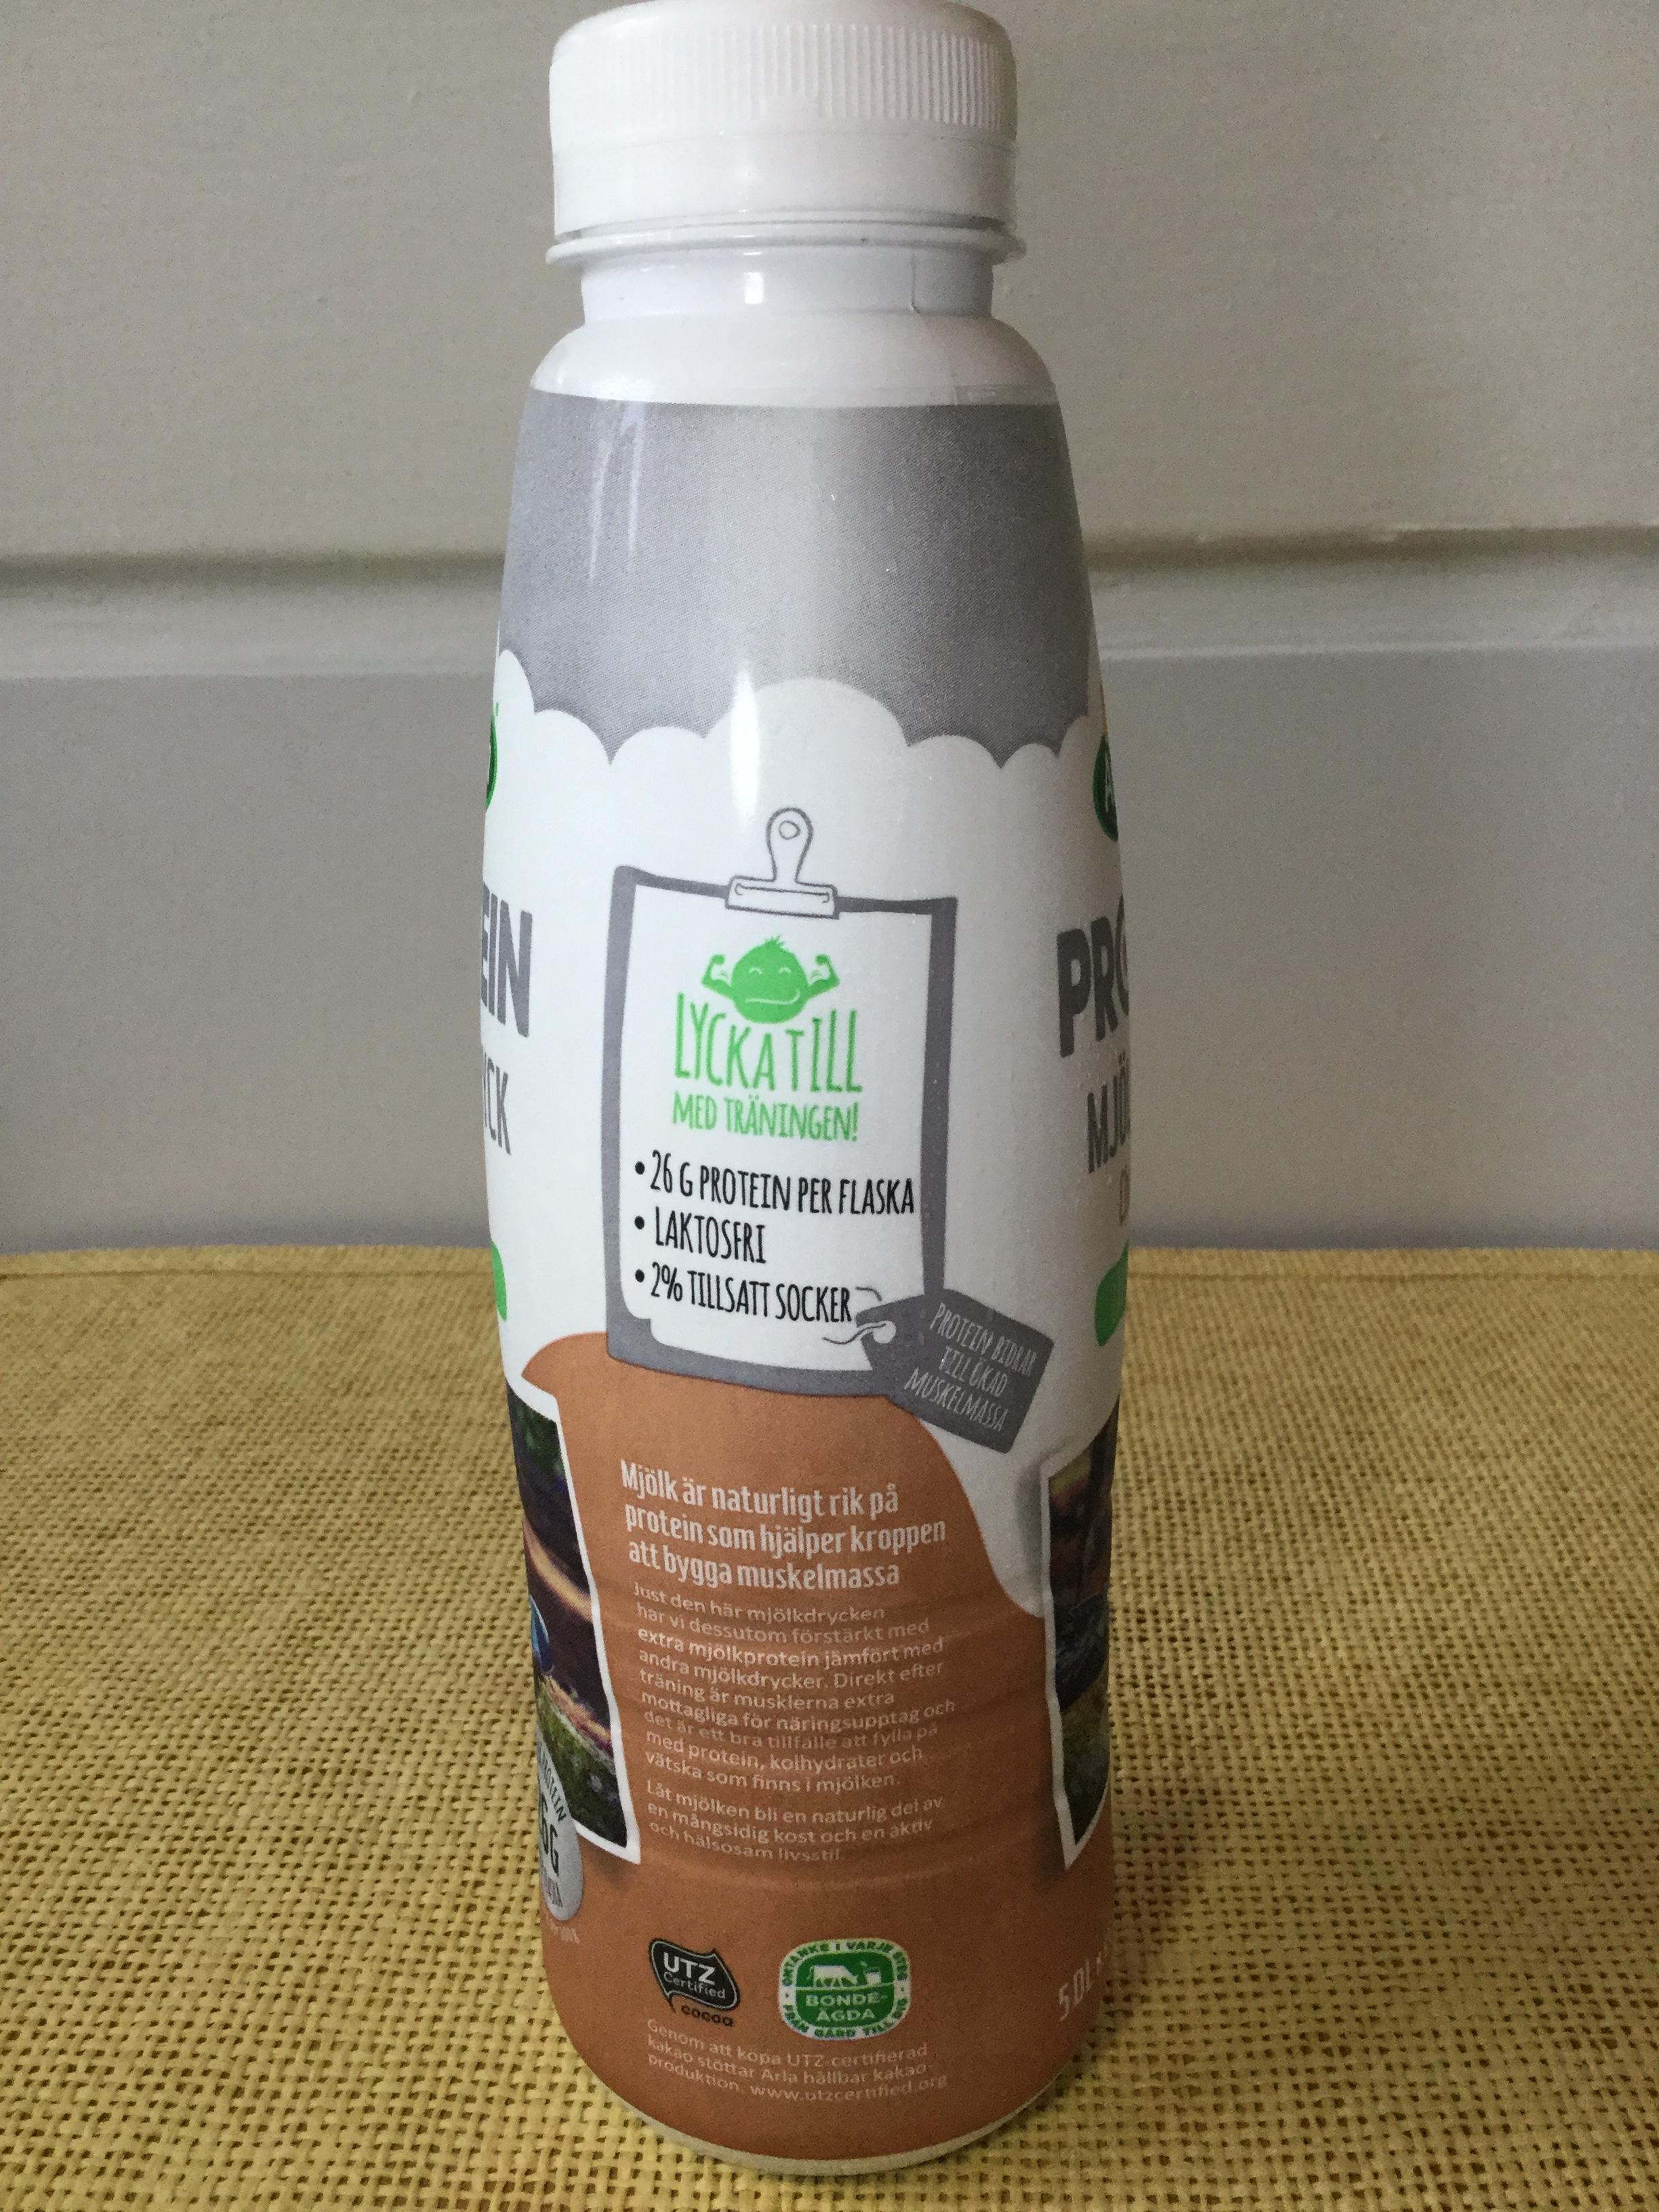 Arla Protein Choklad Mjölkdryck Lactose Free Side 2